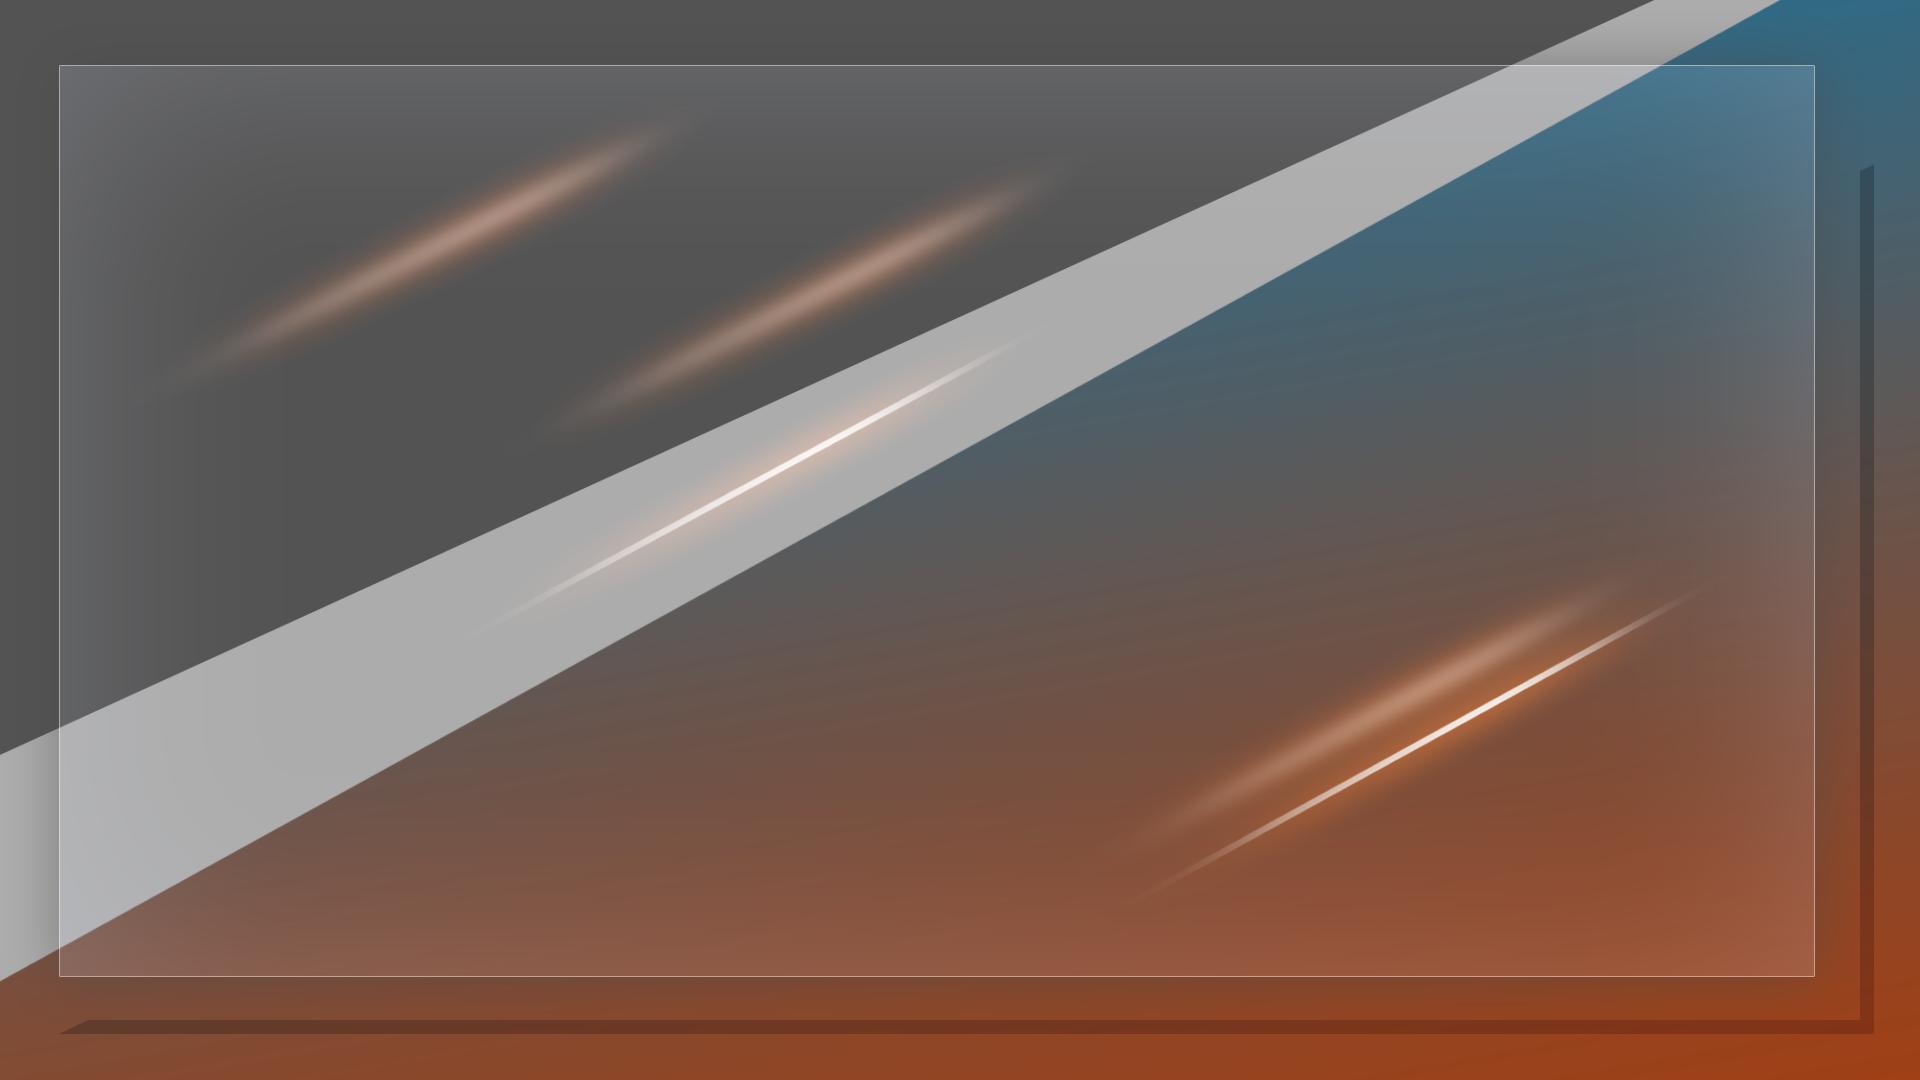 Sleek Orange Blue Full HD Wallpaper And Background Image